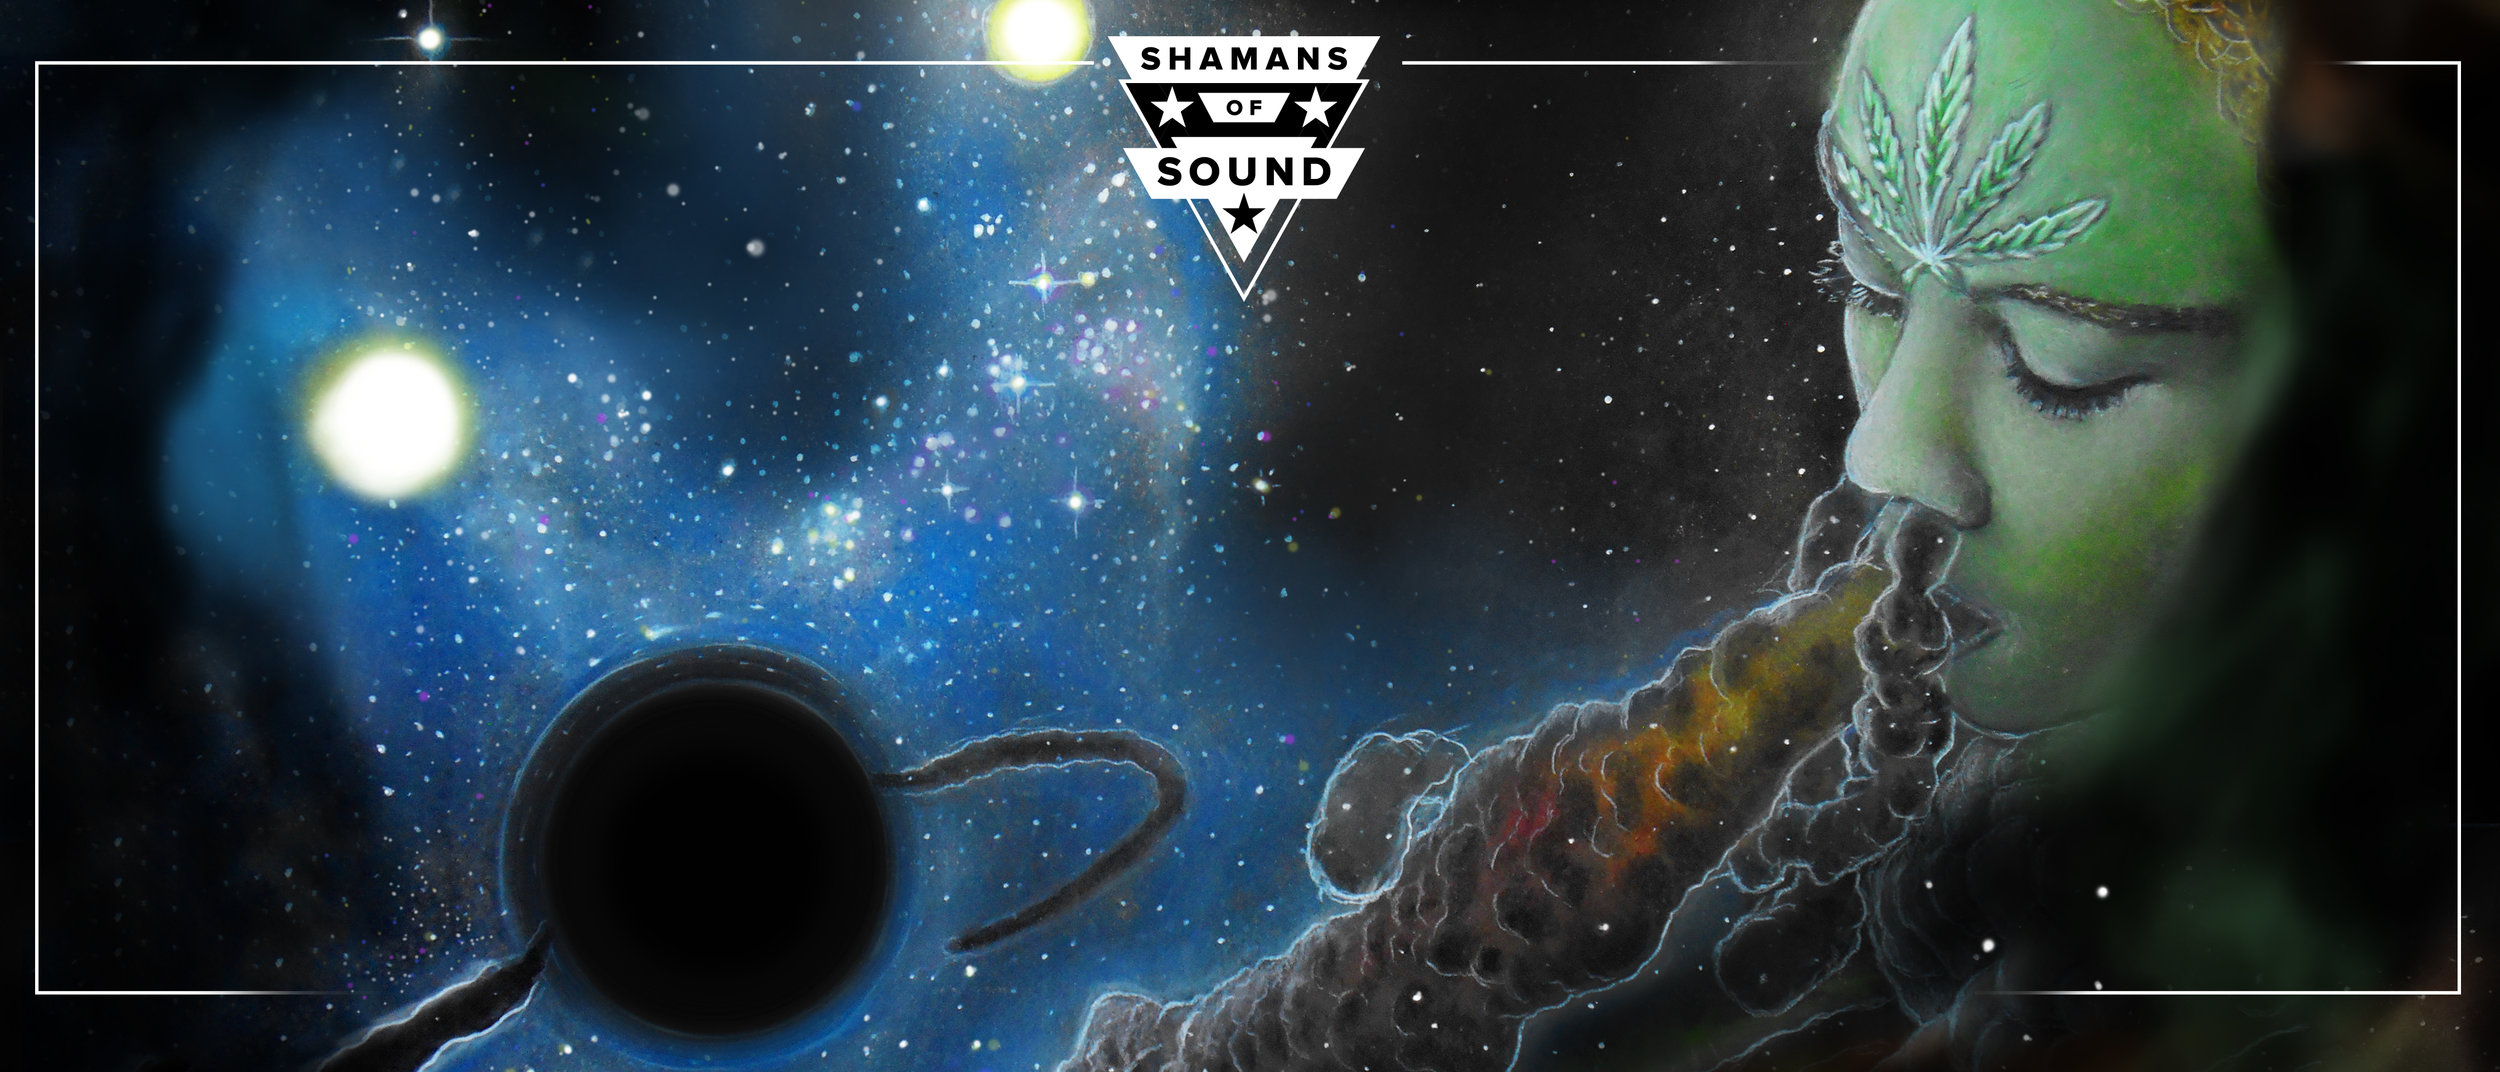 SOS_2018_shamans_of_sound-ST-single-BANNER.jpg